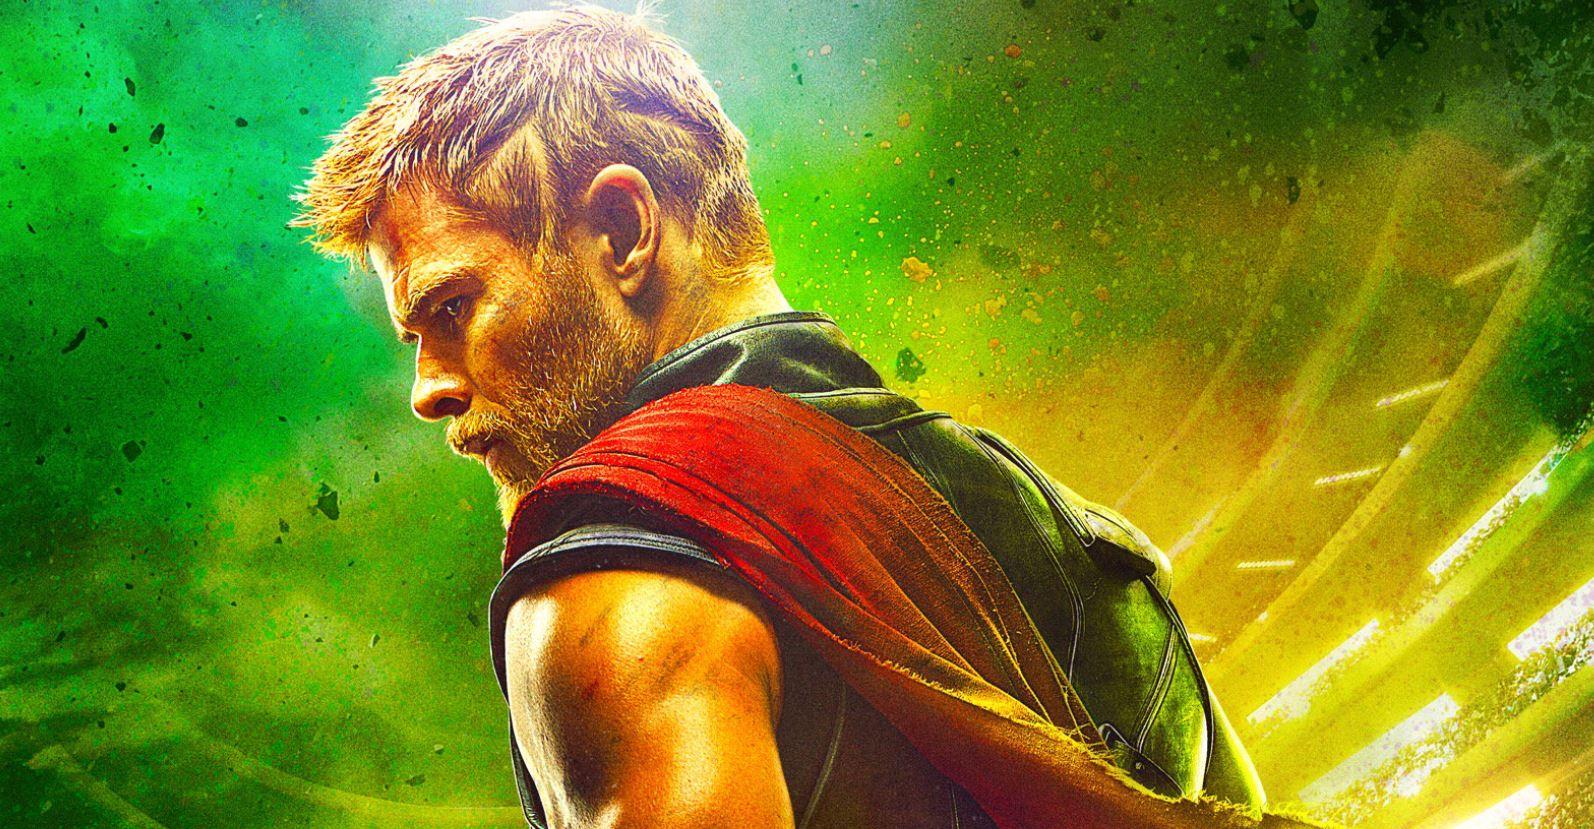 It's the Odinson vs. Hulk in New THOR: RAGNAROK Teaser Trailer!